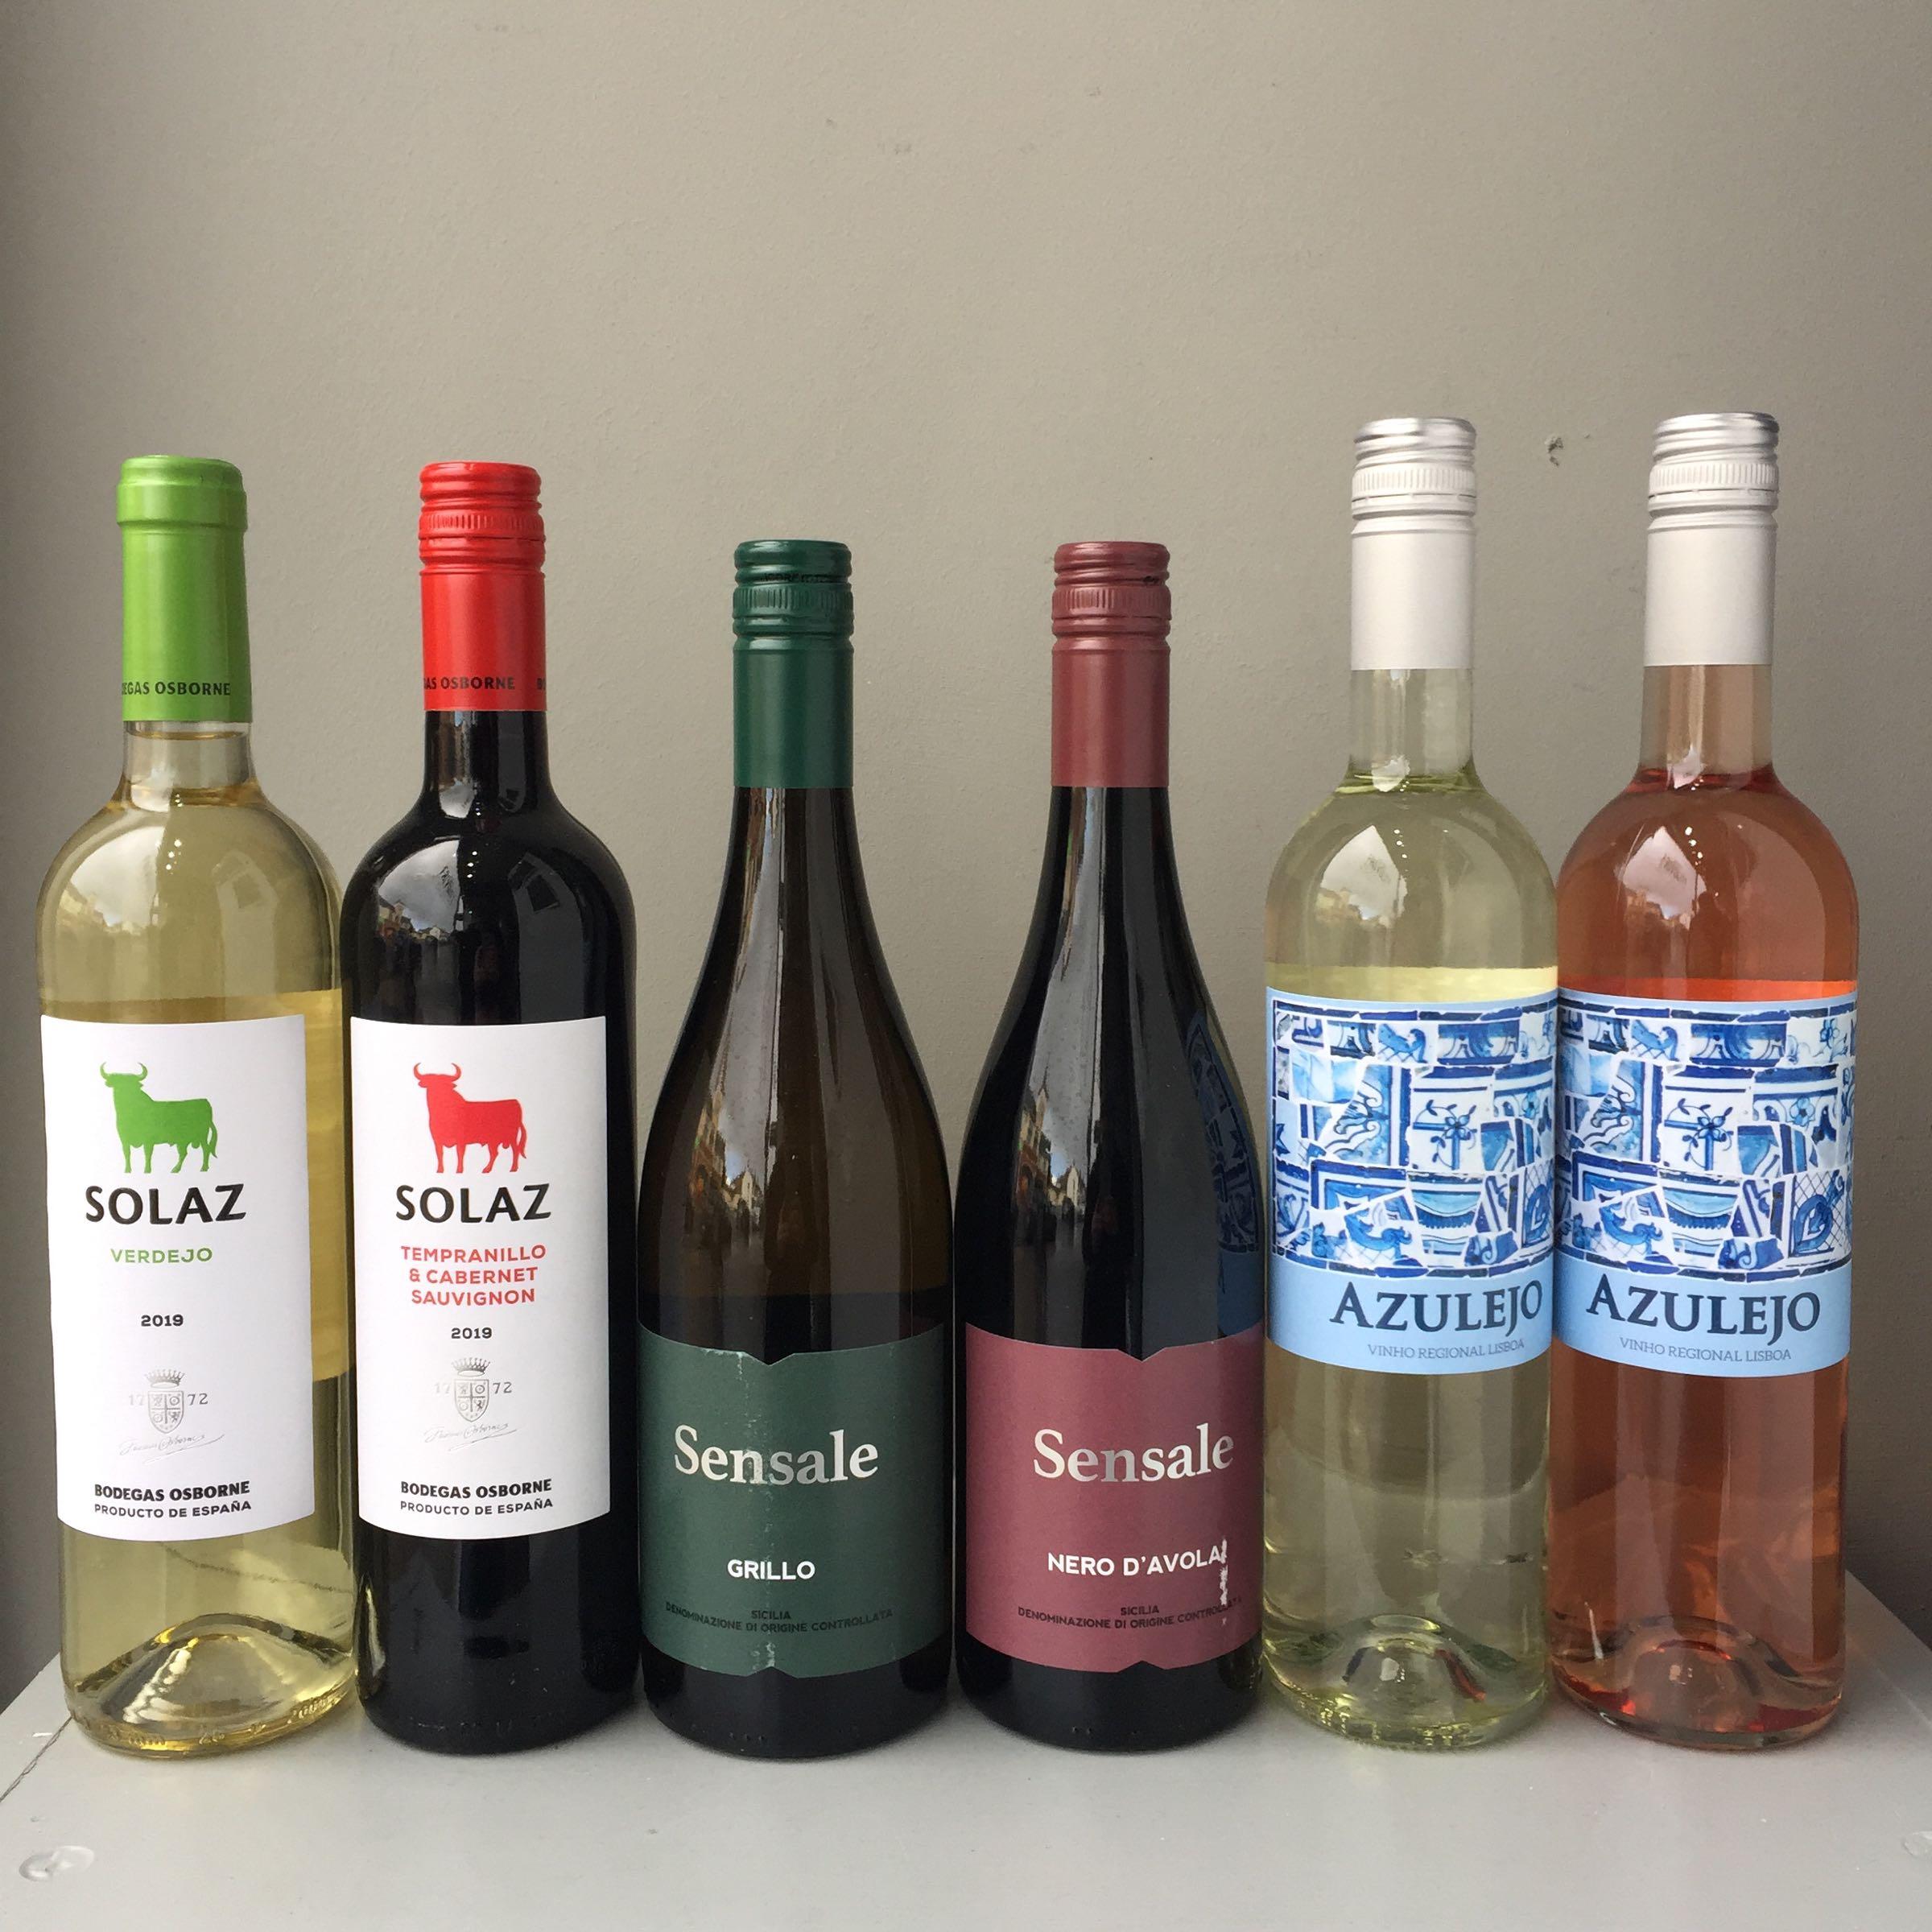 6 Bottle Mixed Case Offer